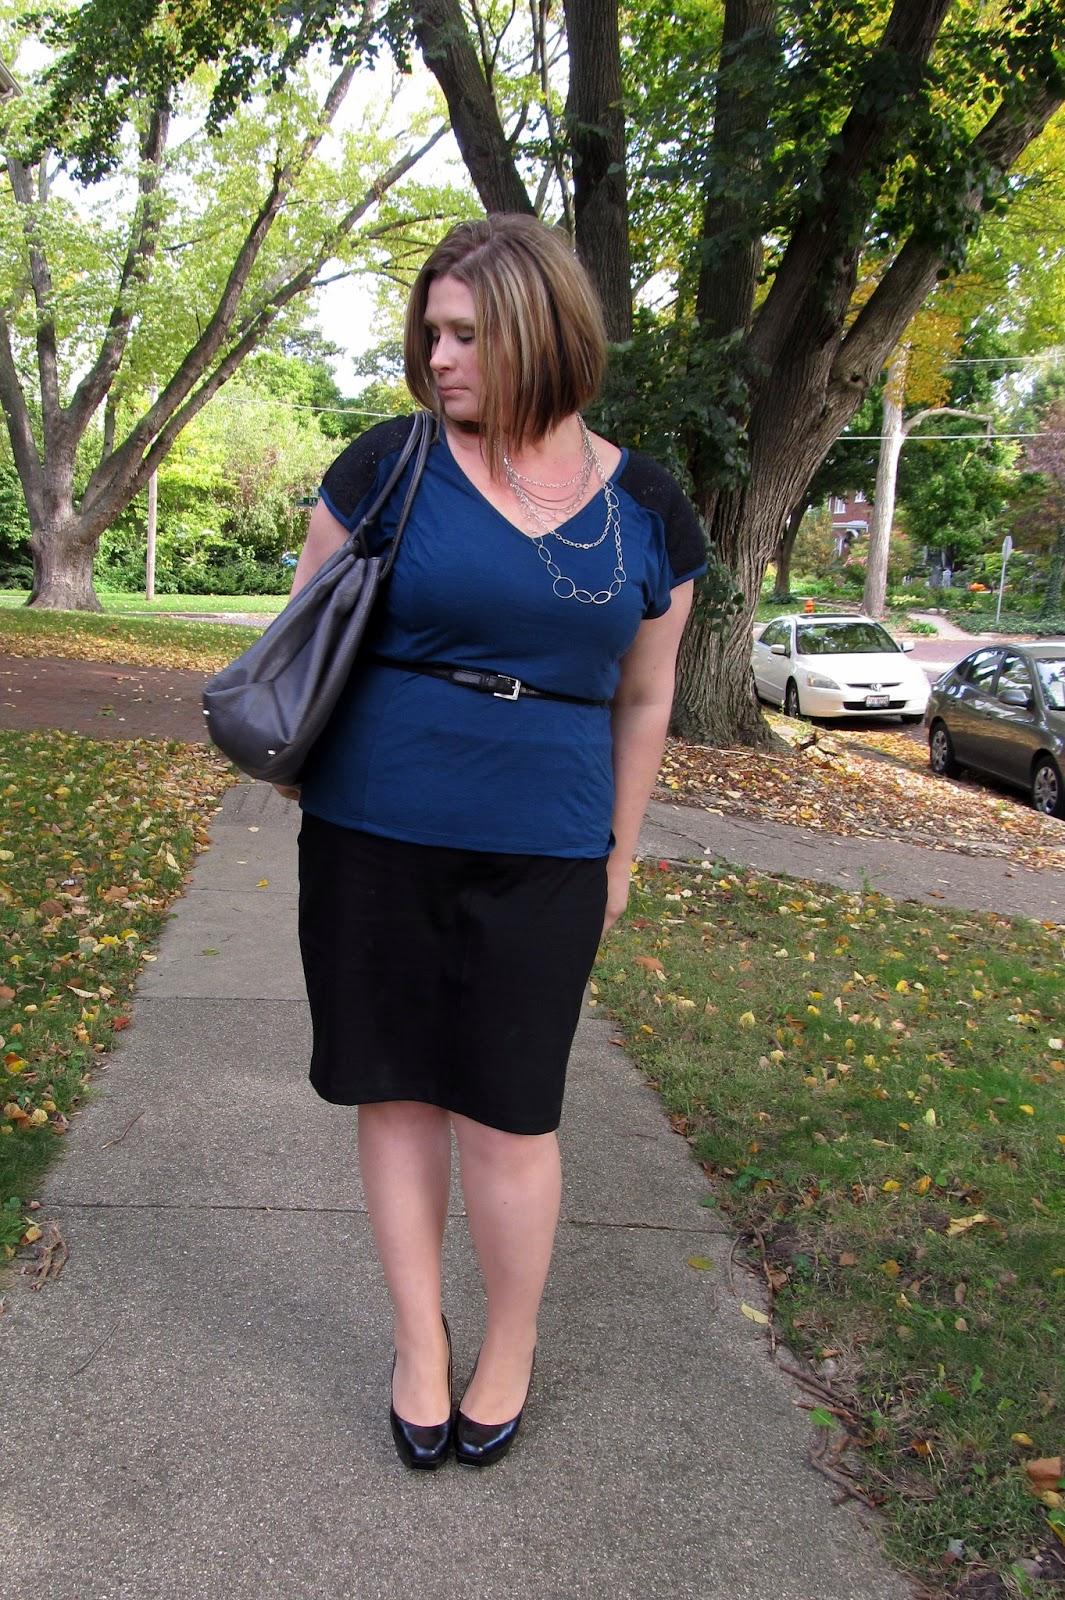 3893c0a8a27 Lace shoulder tee - Lane Bryant   Ponte pencil skirt - Dorothy Perkins    Handbag - Furla (via TJMaxx)   Shoes - Nine West